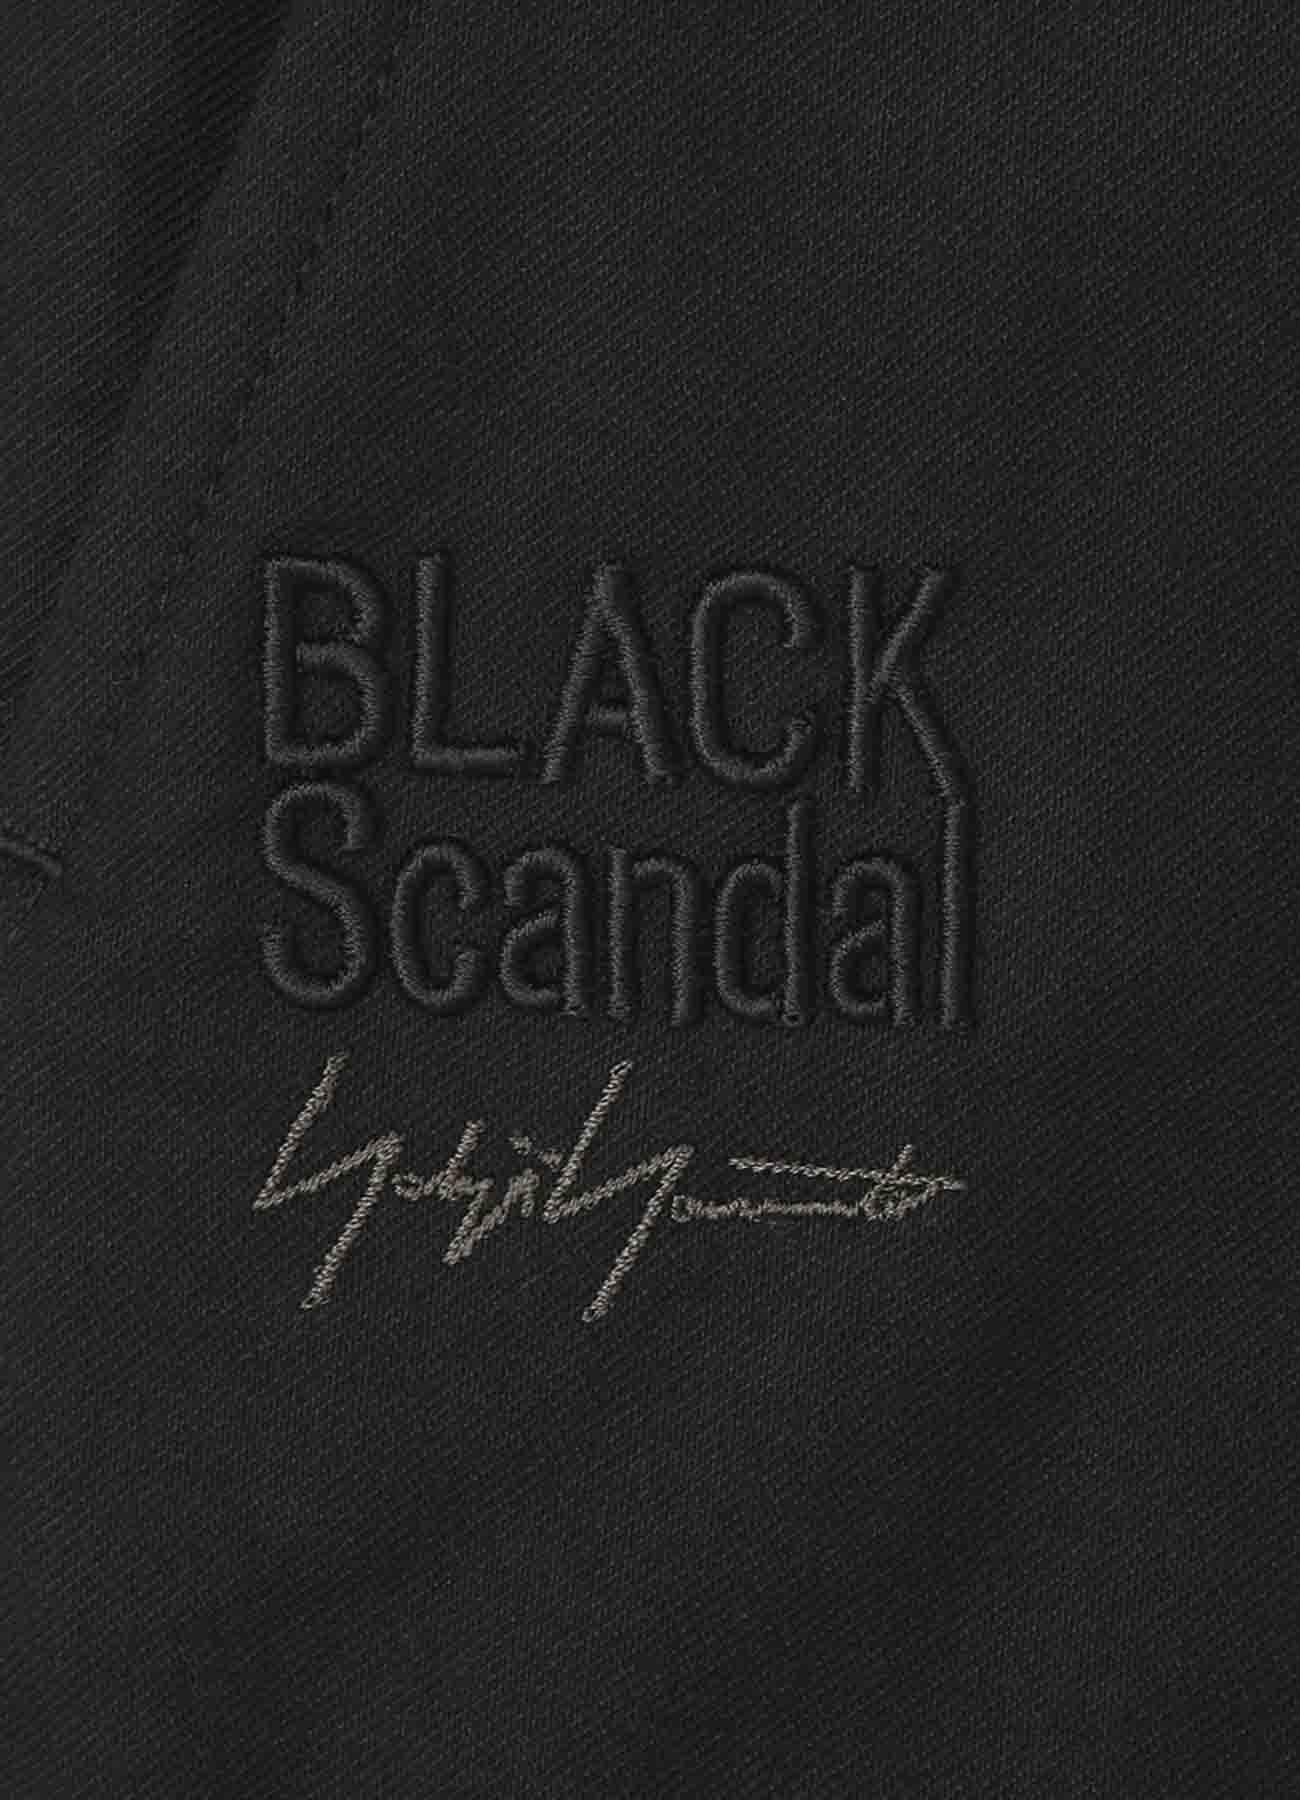 BLACK Scandal刺繍ツイル 左脇ファスナー付きパンツ